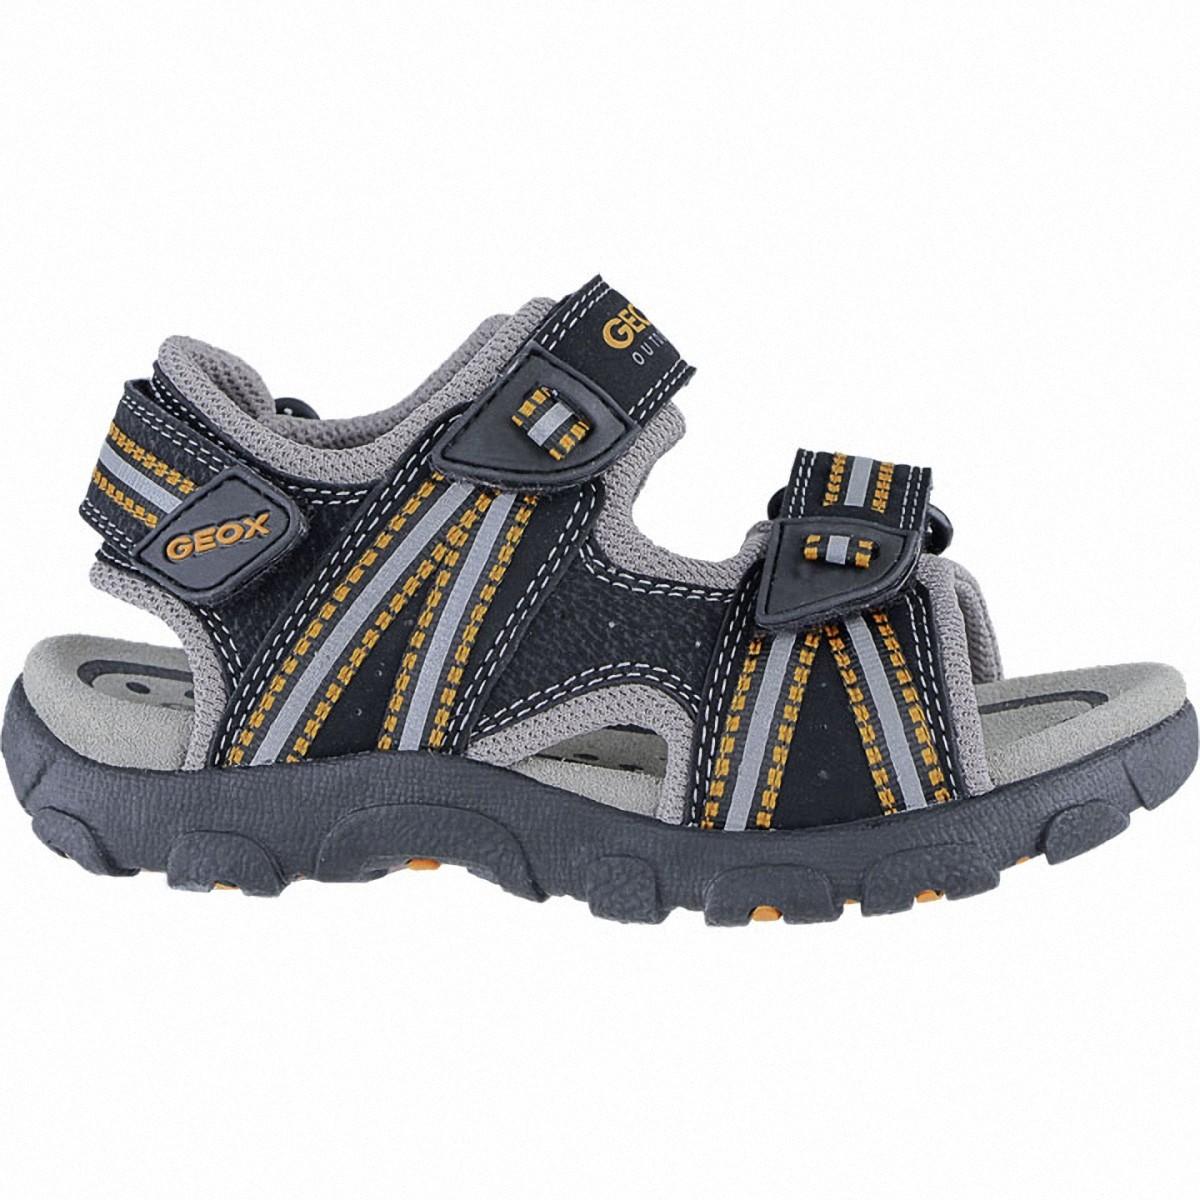 Geox coole Jungen Synthetik Sandalen black, weiches Geox Leder Fußbett, Antis